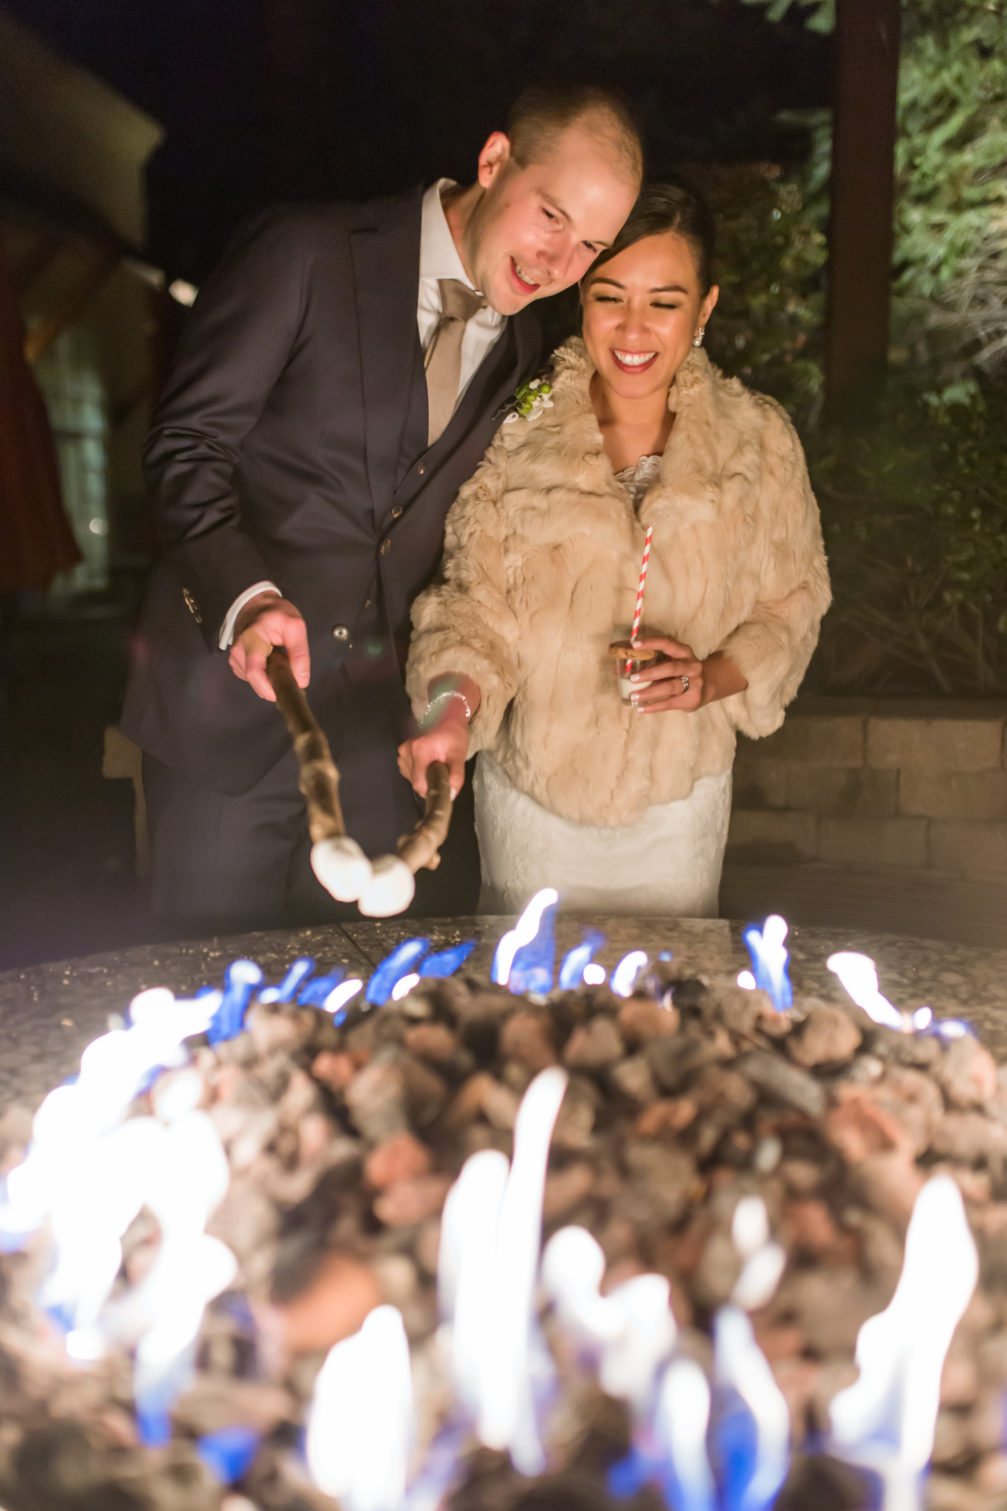 bride and groom roasting smores